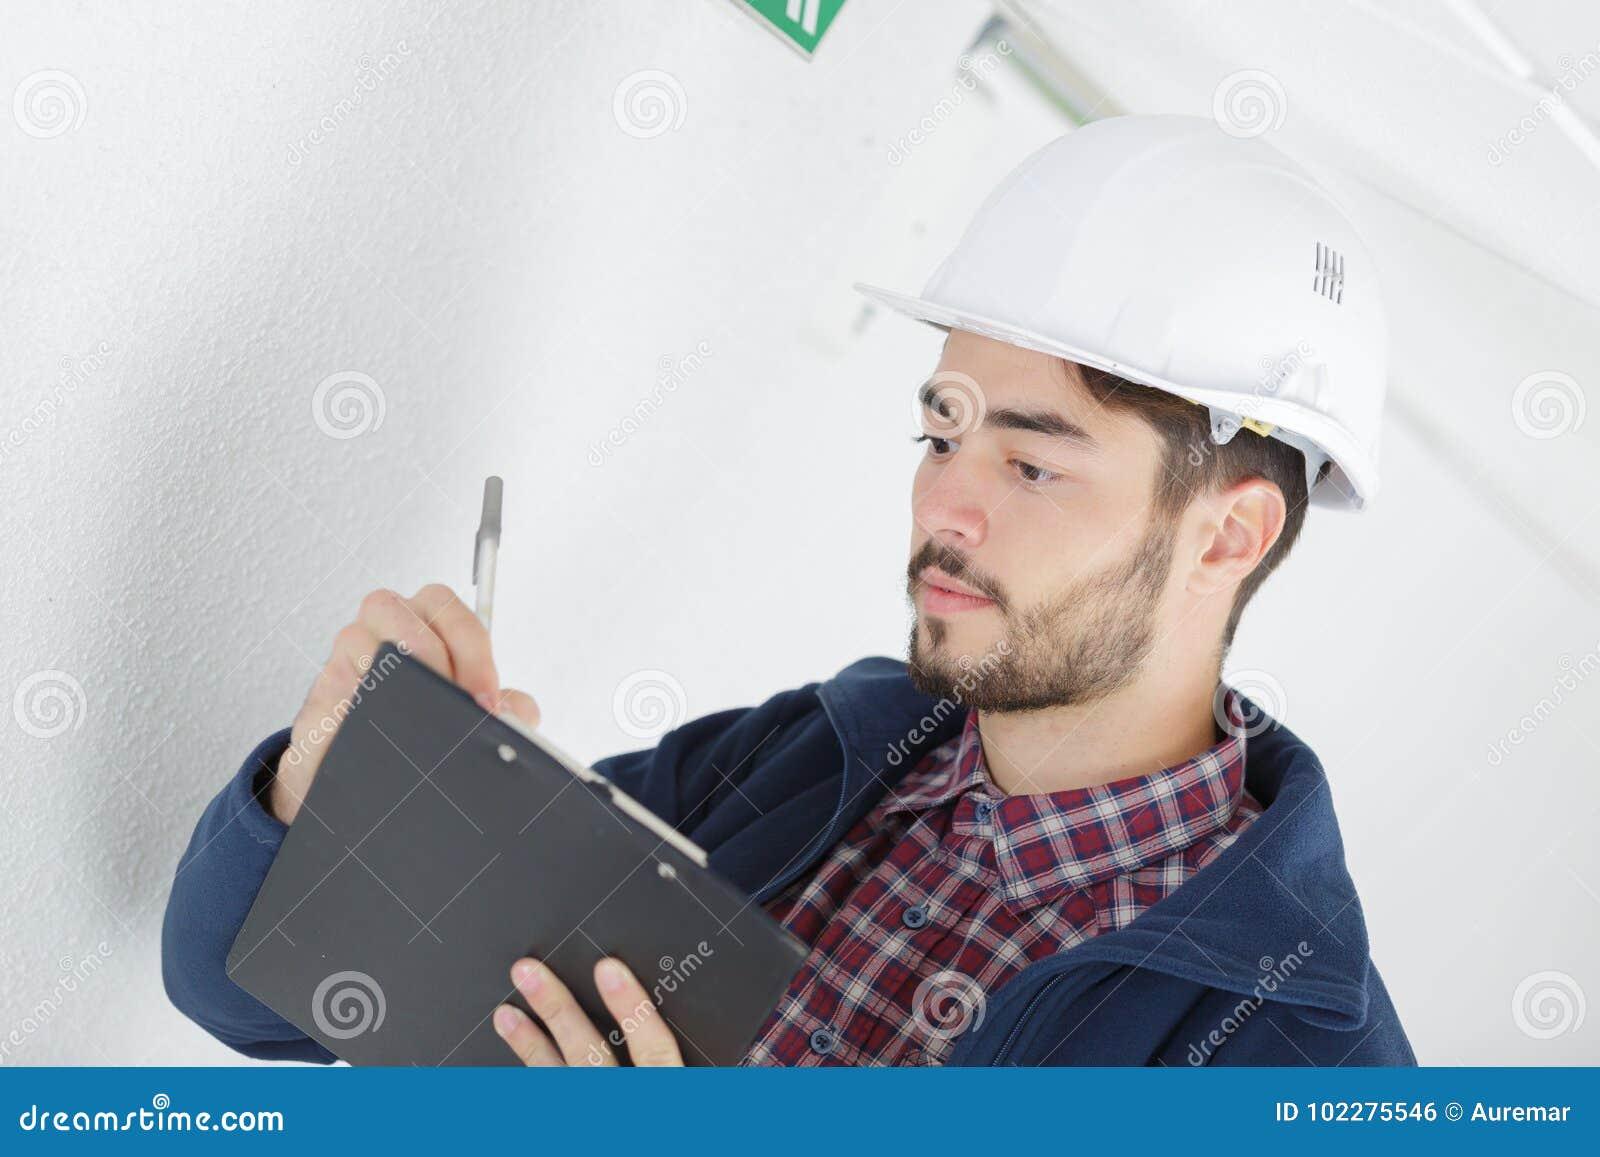 Technician doing bidding estimate